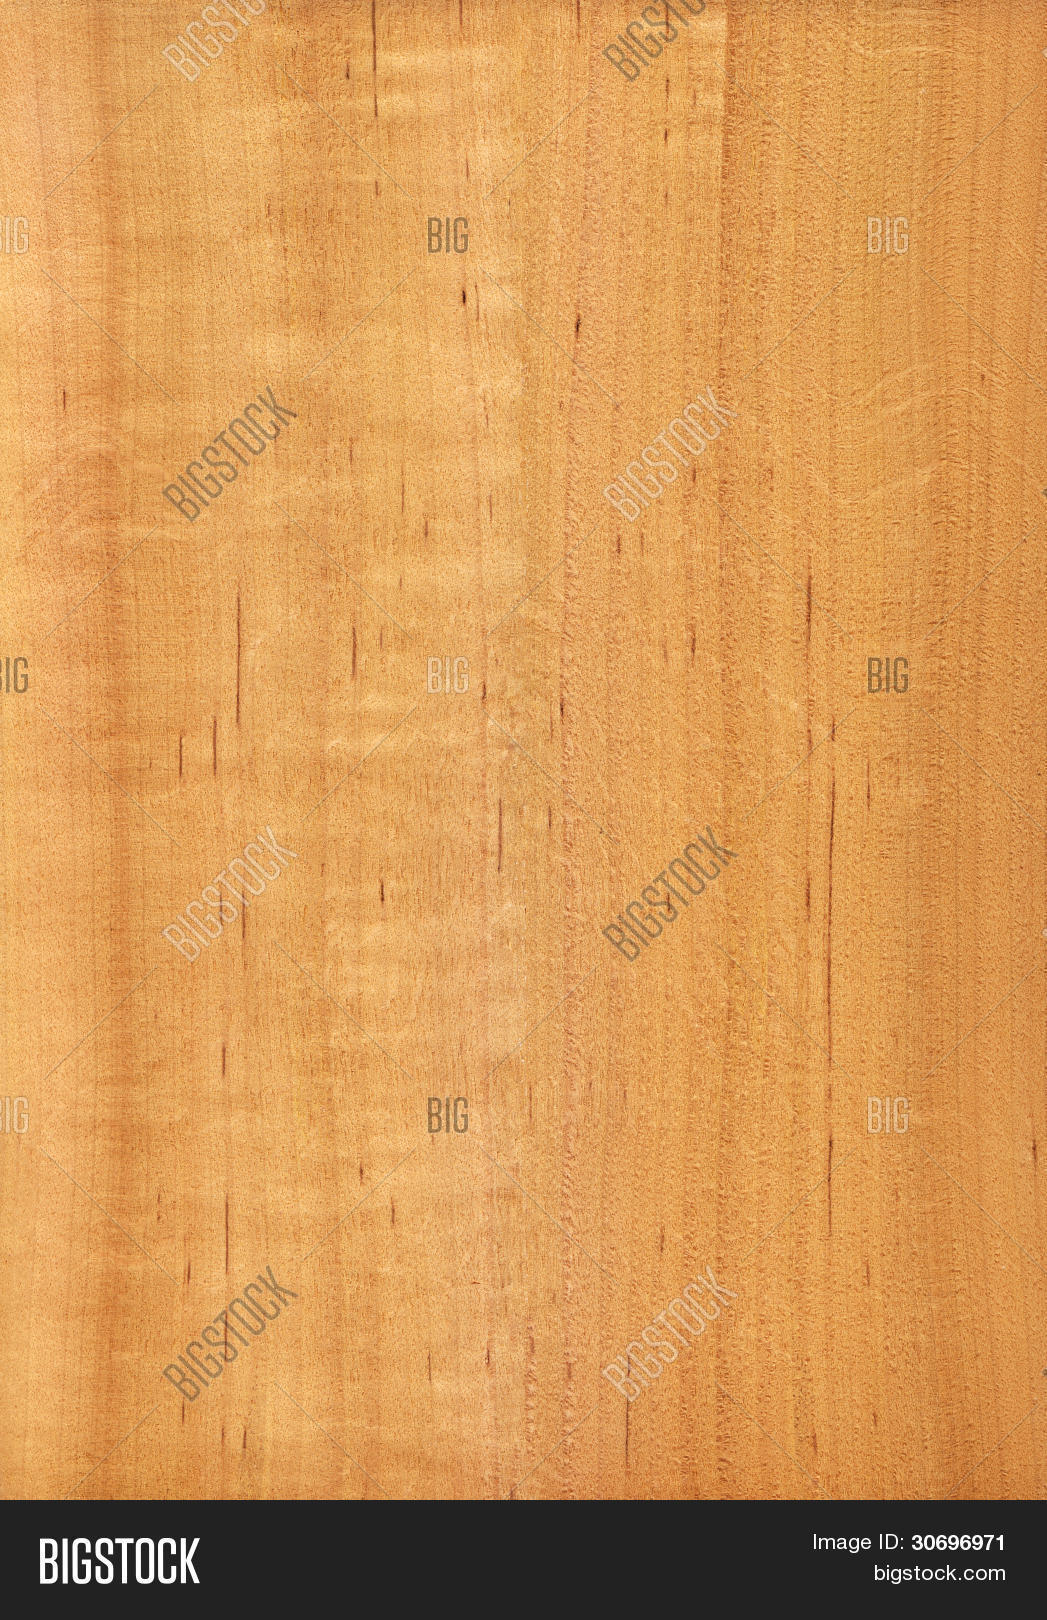 Alder Wood Texture Image Photo Free Trial Bigstock